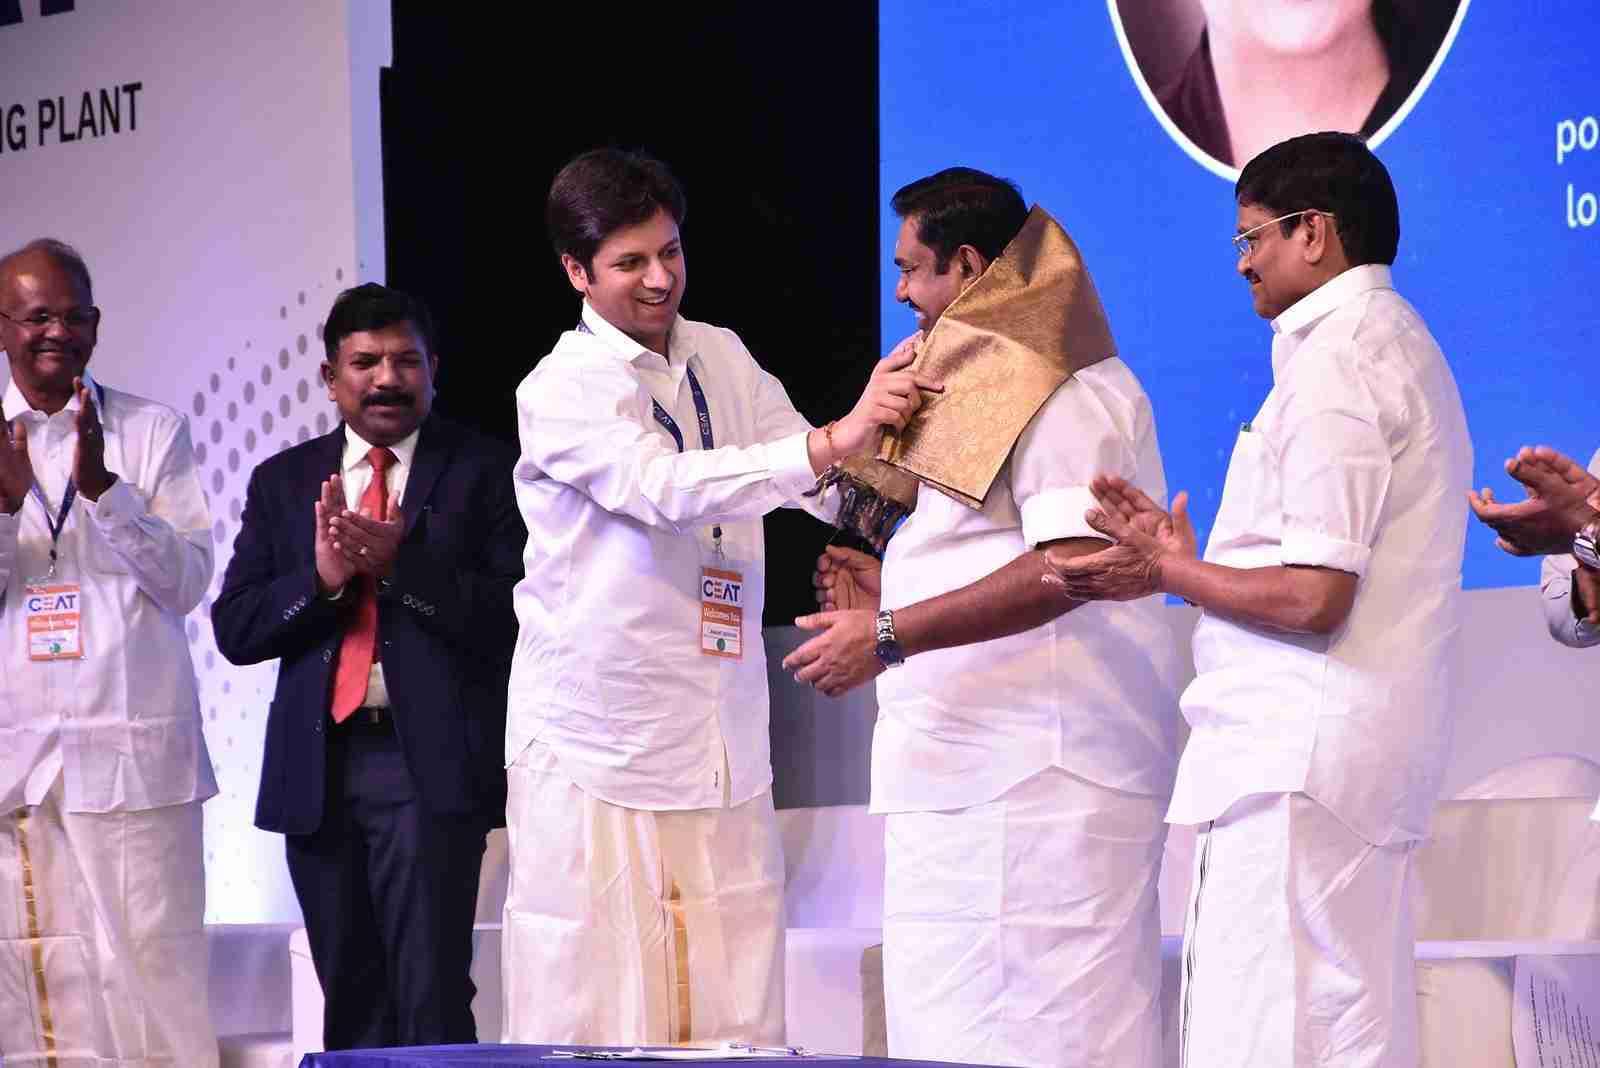 Mr Anant Goenka, Managing Director, CEAT Tyres Ltd, Shri Edapaddi Palaniswami, CM of Tamil Nadu & Shri M.C. Sampath Minister of Industries